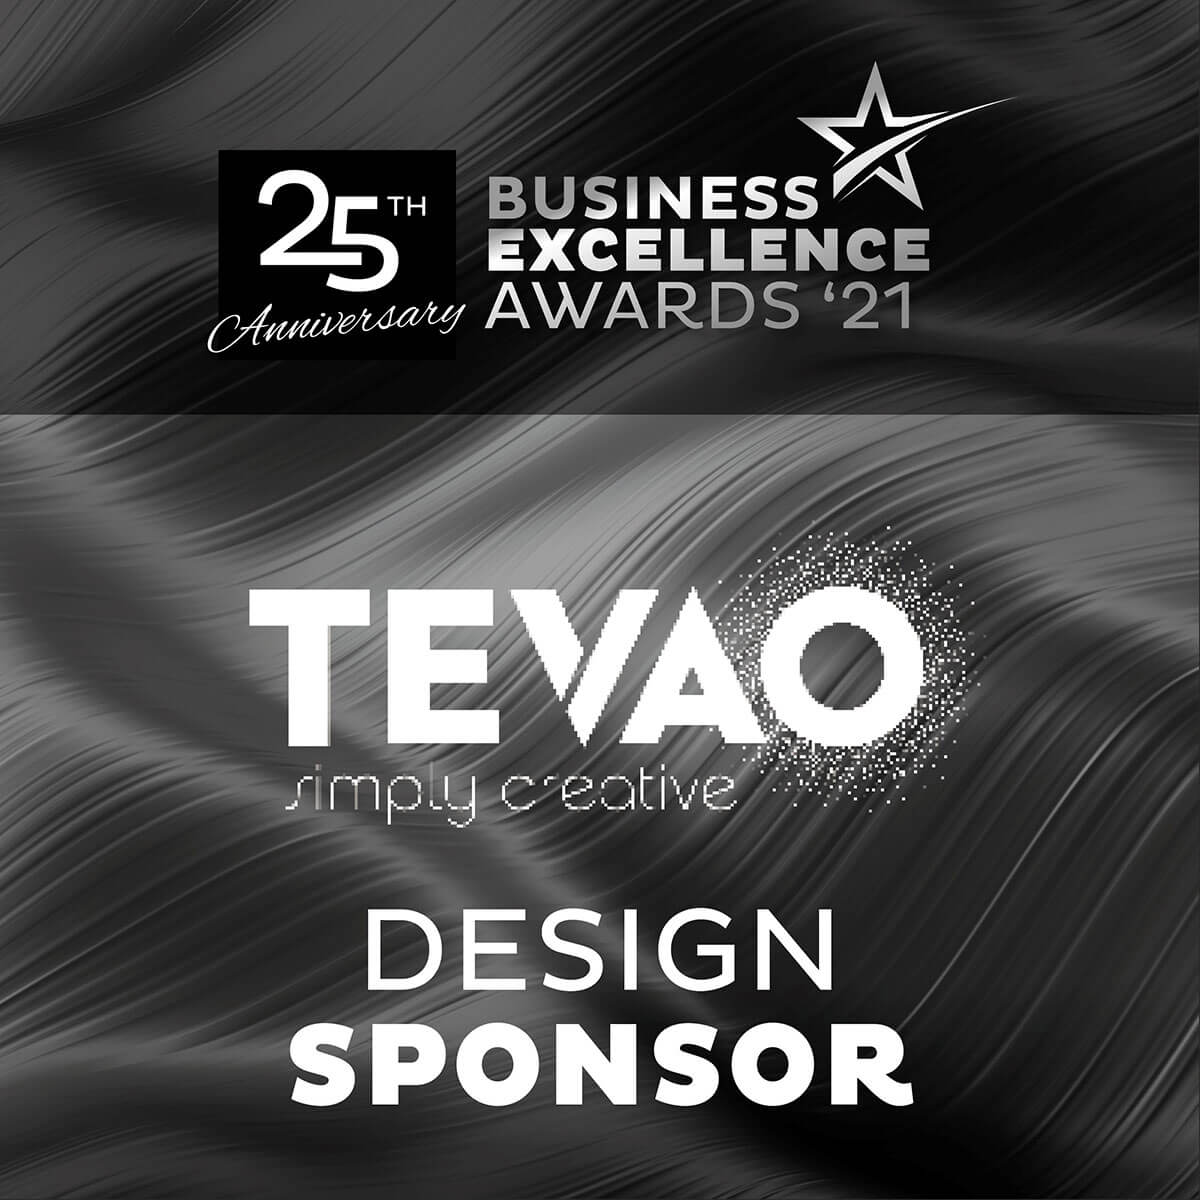 design sponsor